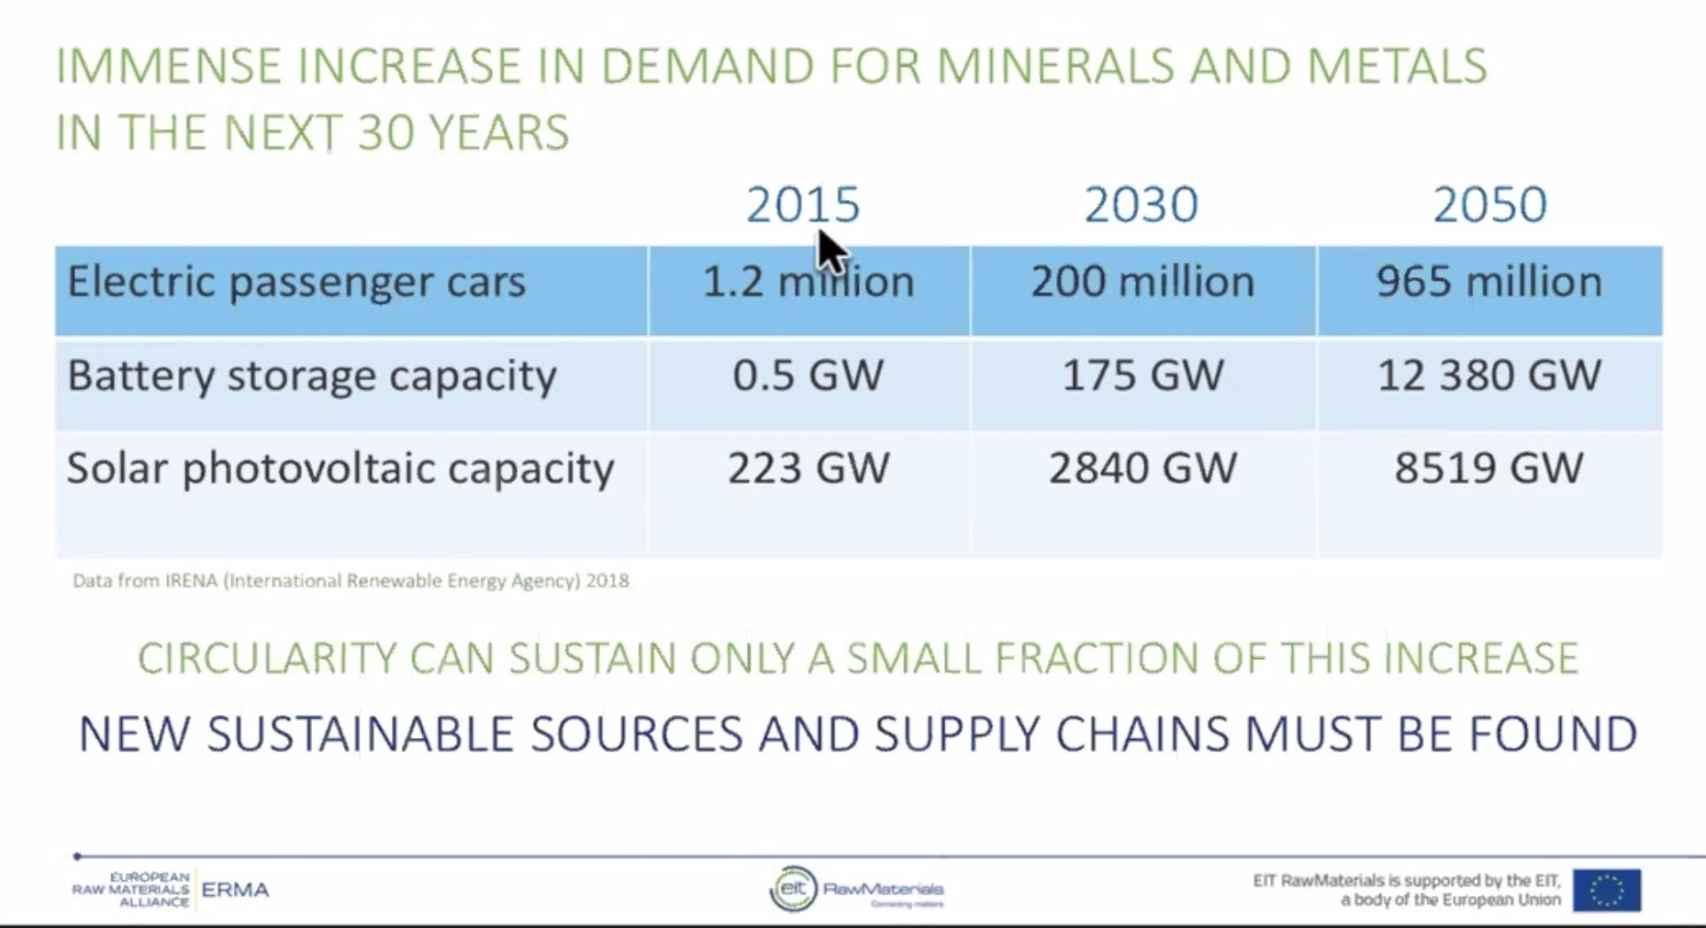 Demanda de minerales criticos para 2050